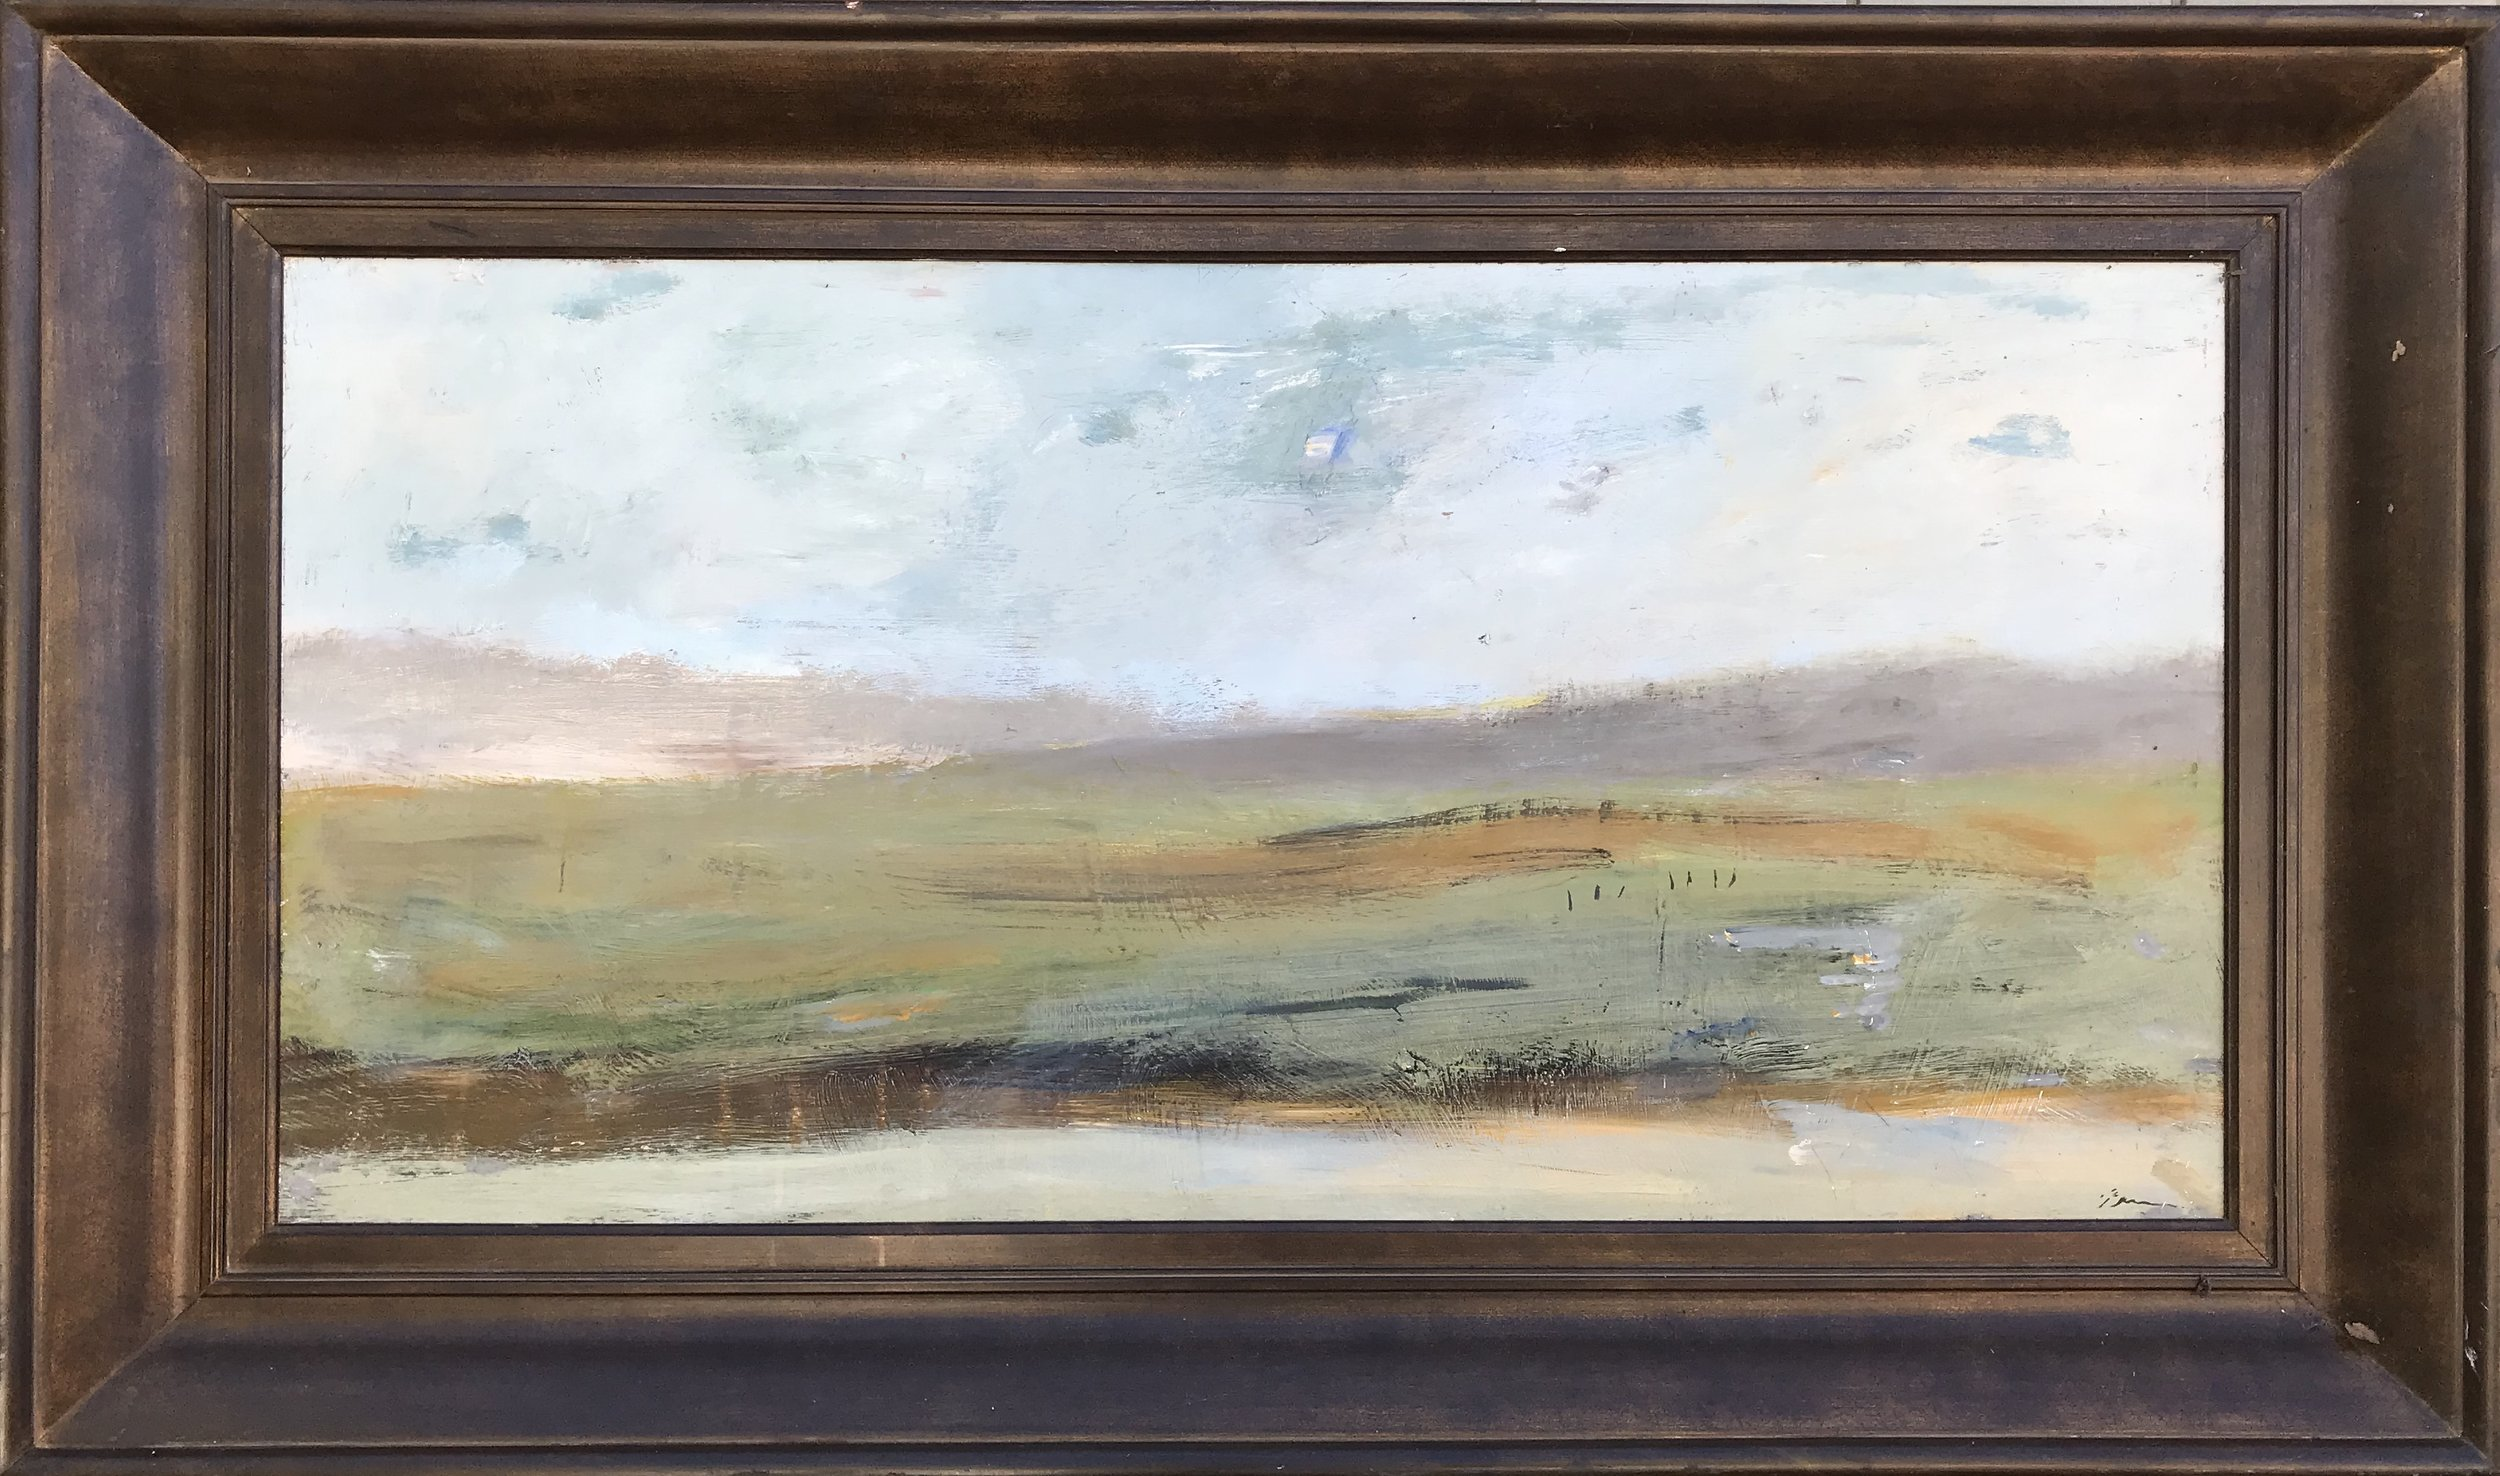 """Taking the Backroads"" - 24"" x 48"", oil on canvas framed in 3"" deep wood frameValue: $4,700Opening bid: $1,850email your bid to: art@bradfordbrenner.com"